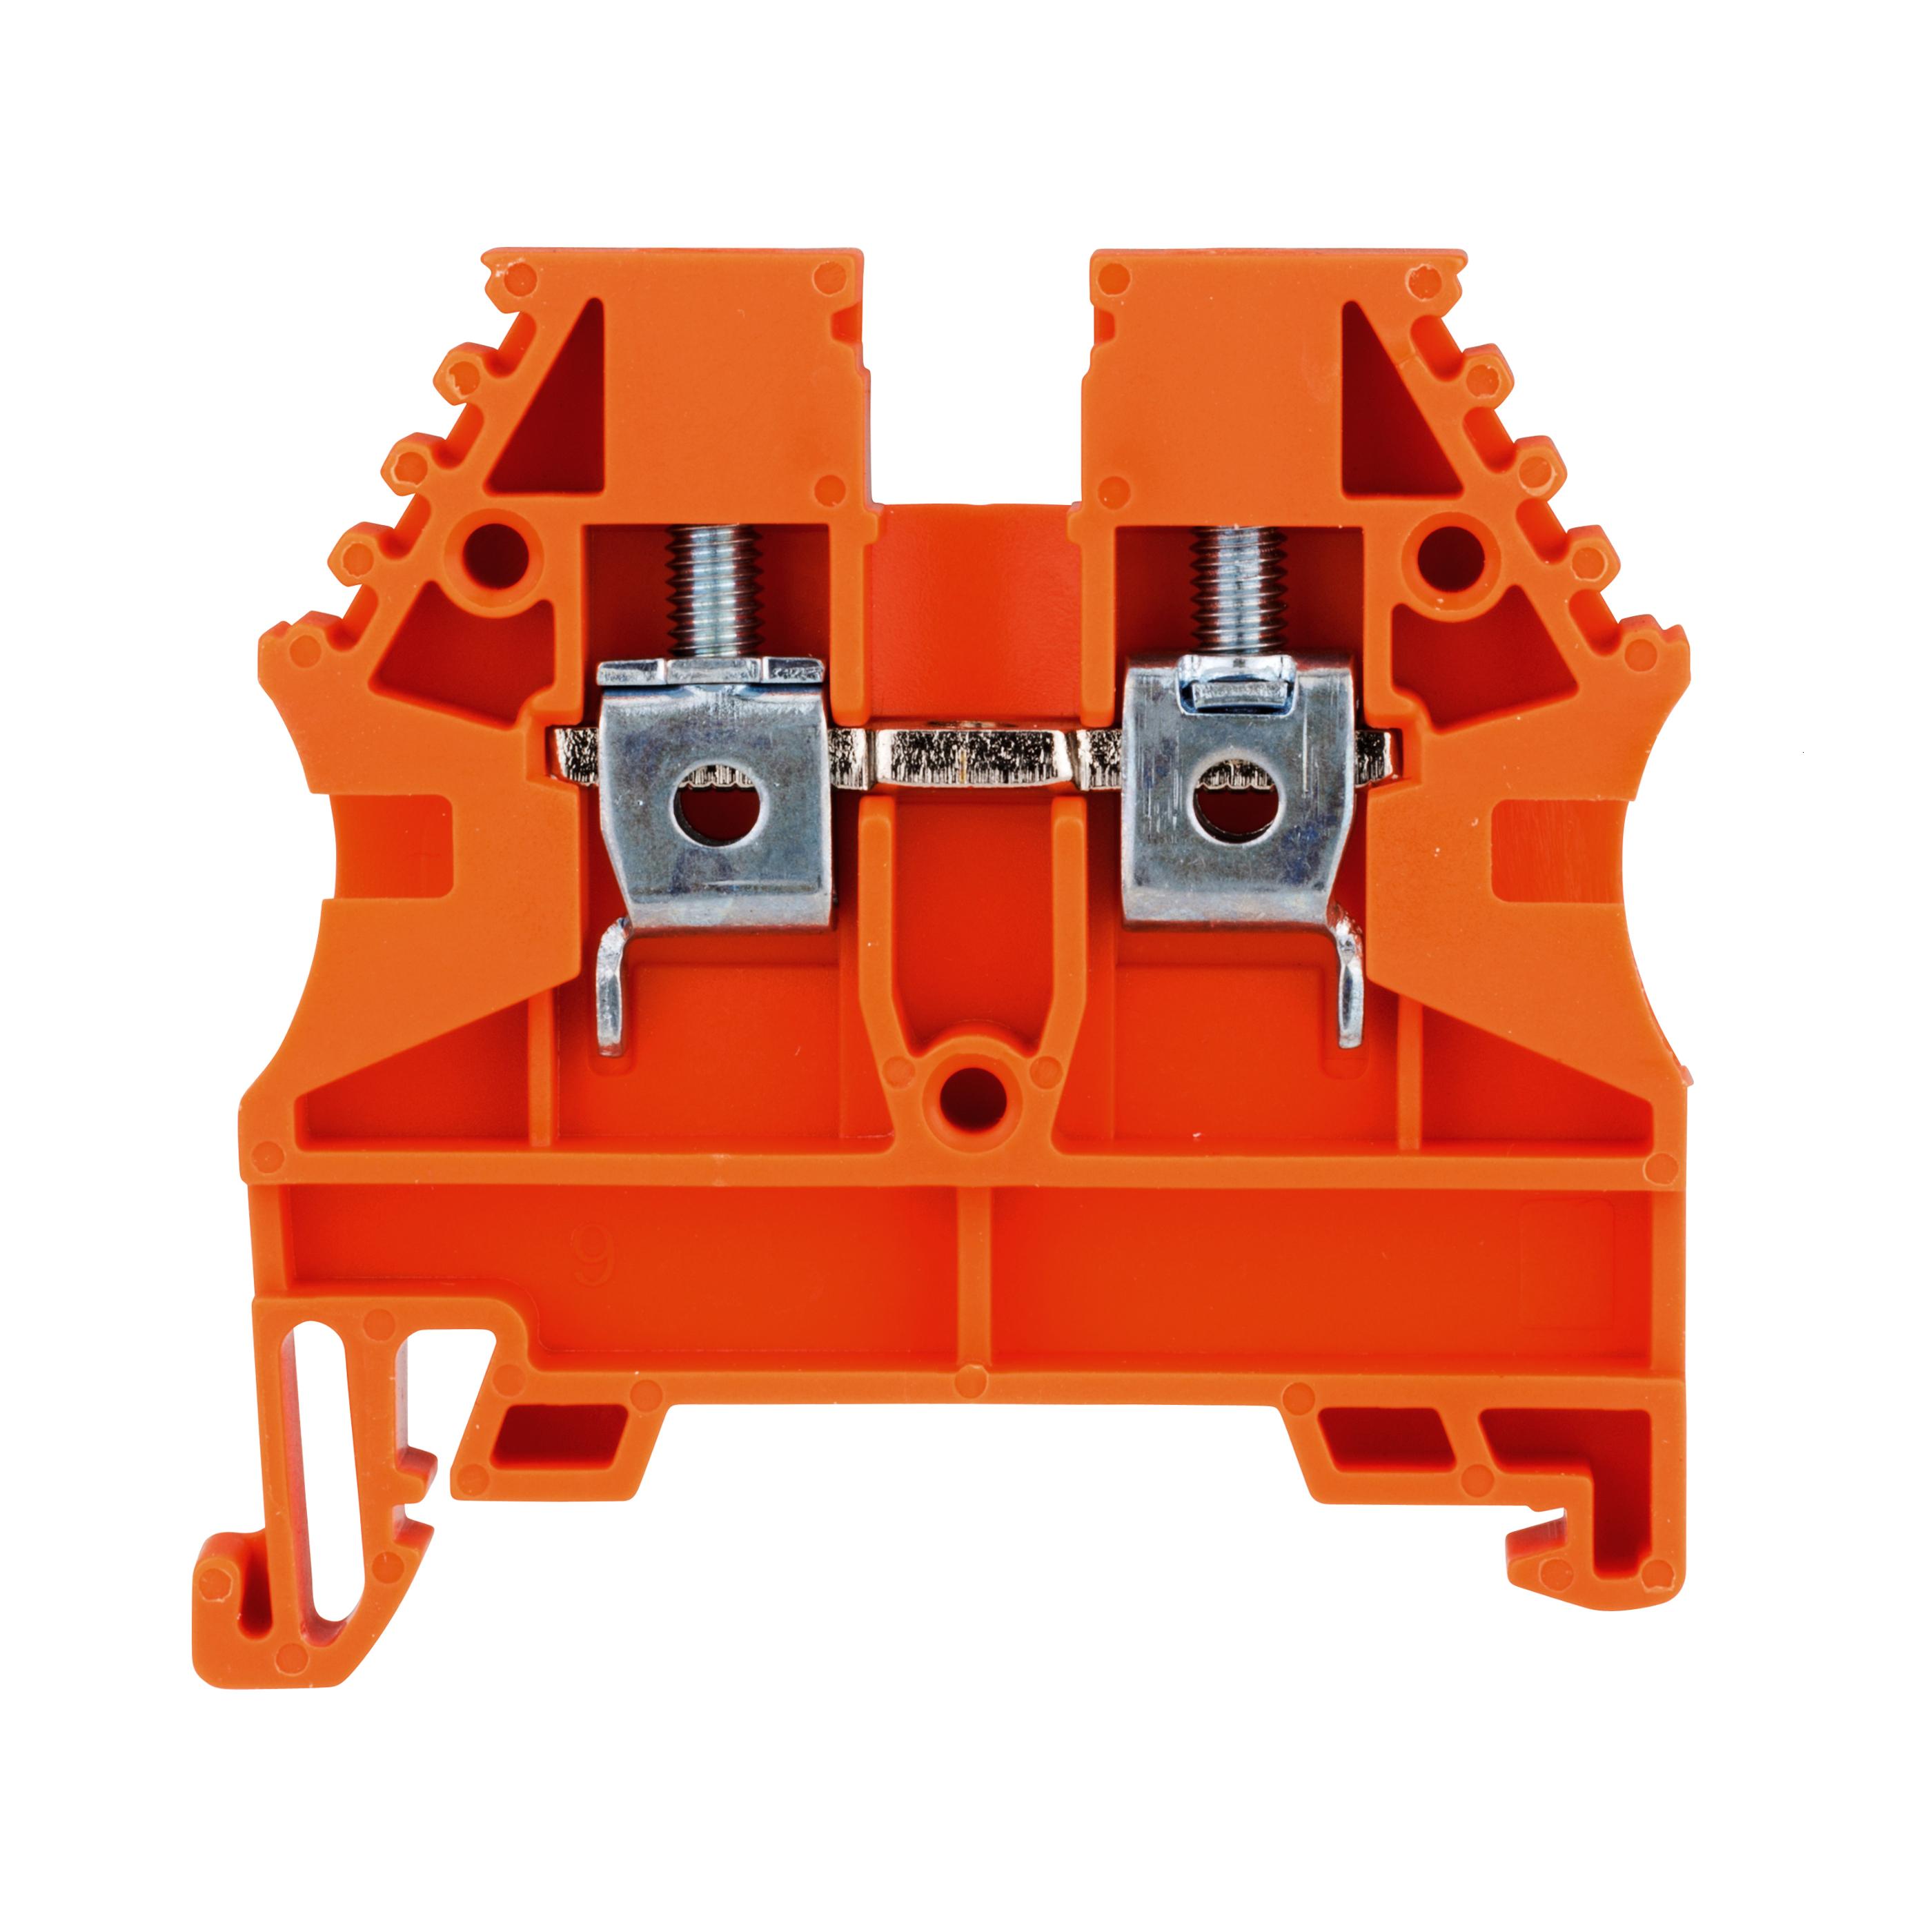 1 Stk Reihenklemme 4mm² AVK 4, orange IK608014--